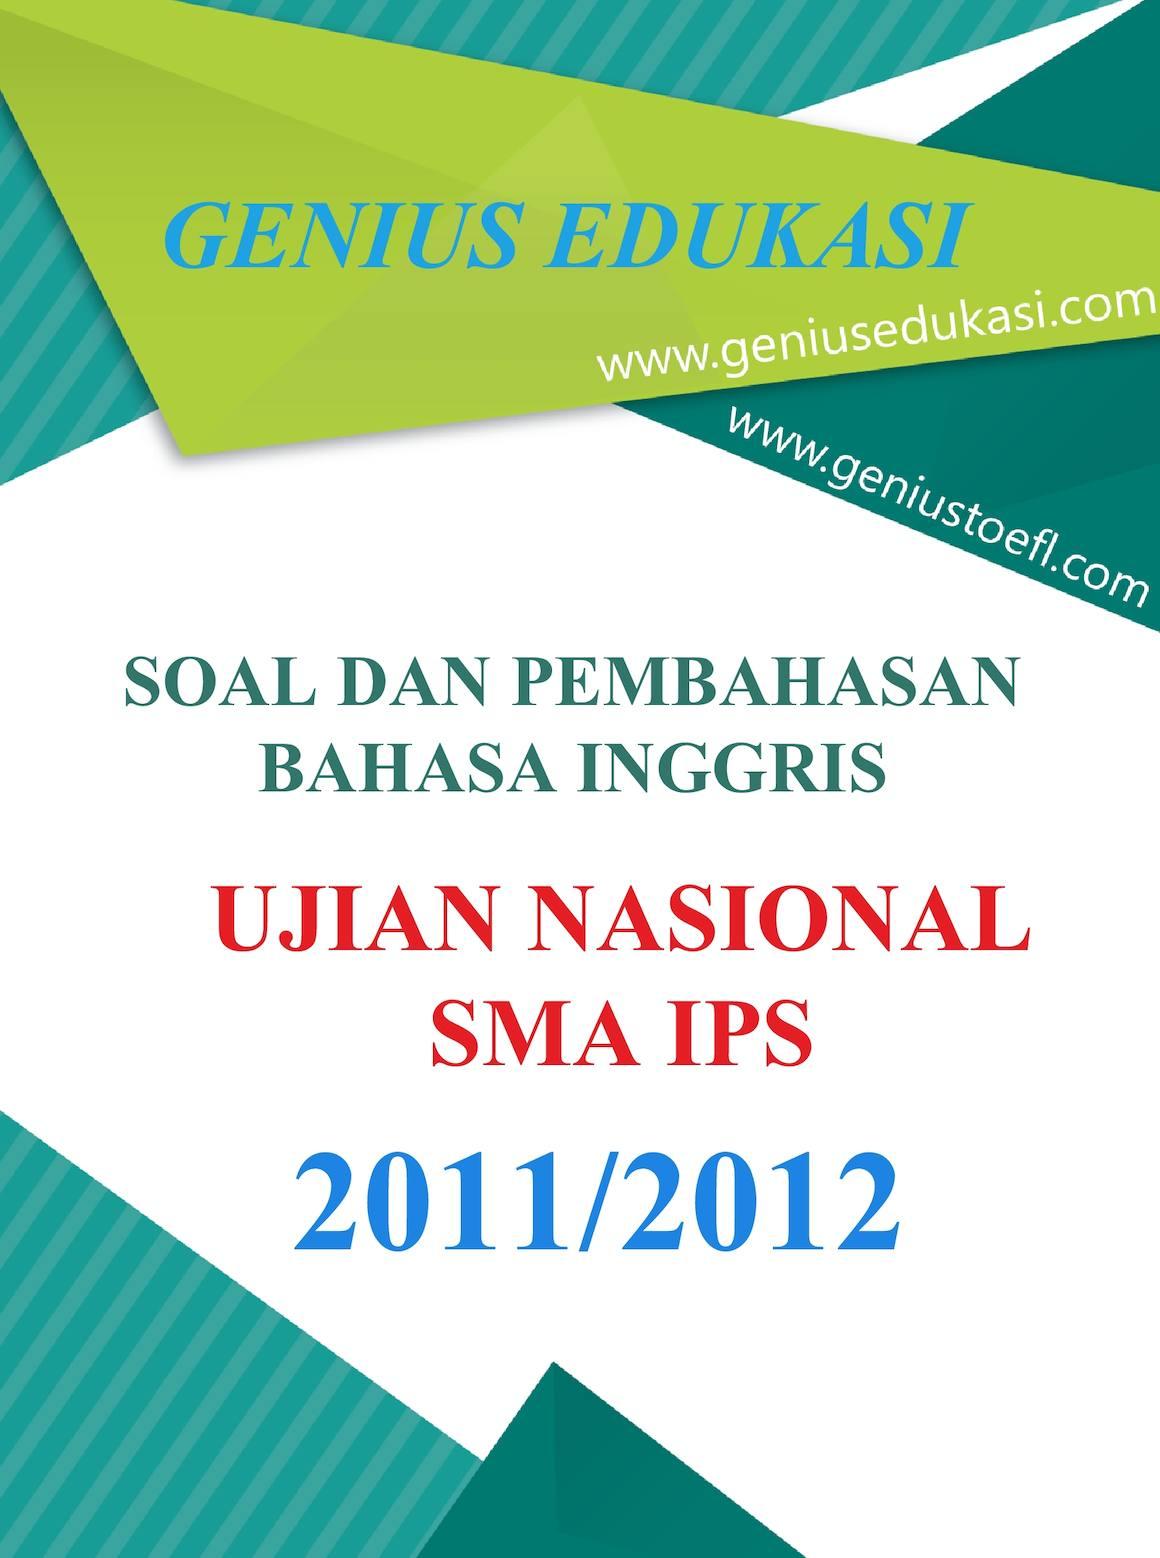 Calam 233 O Soal Dan Pembahasan Un Bahasa Inggris Sma Ips 2011 2012